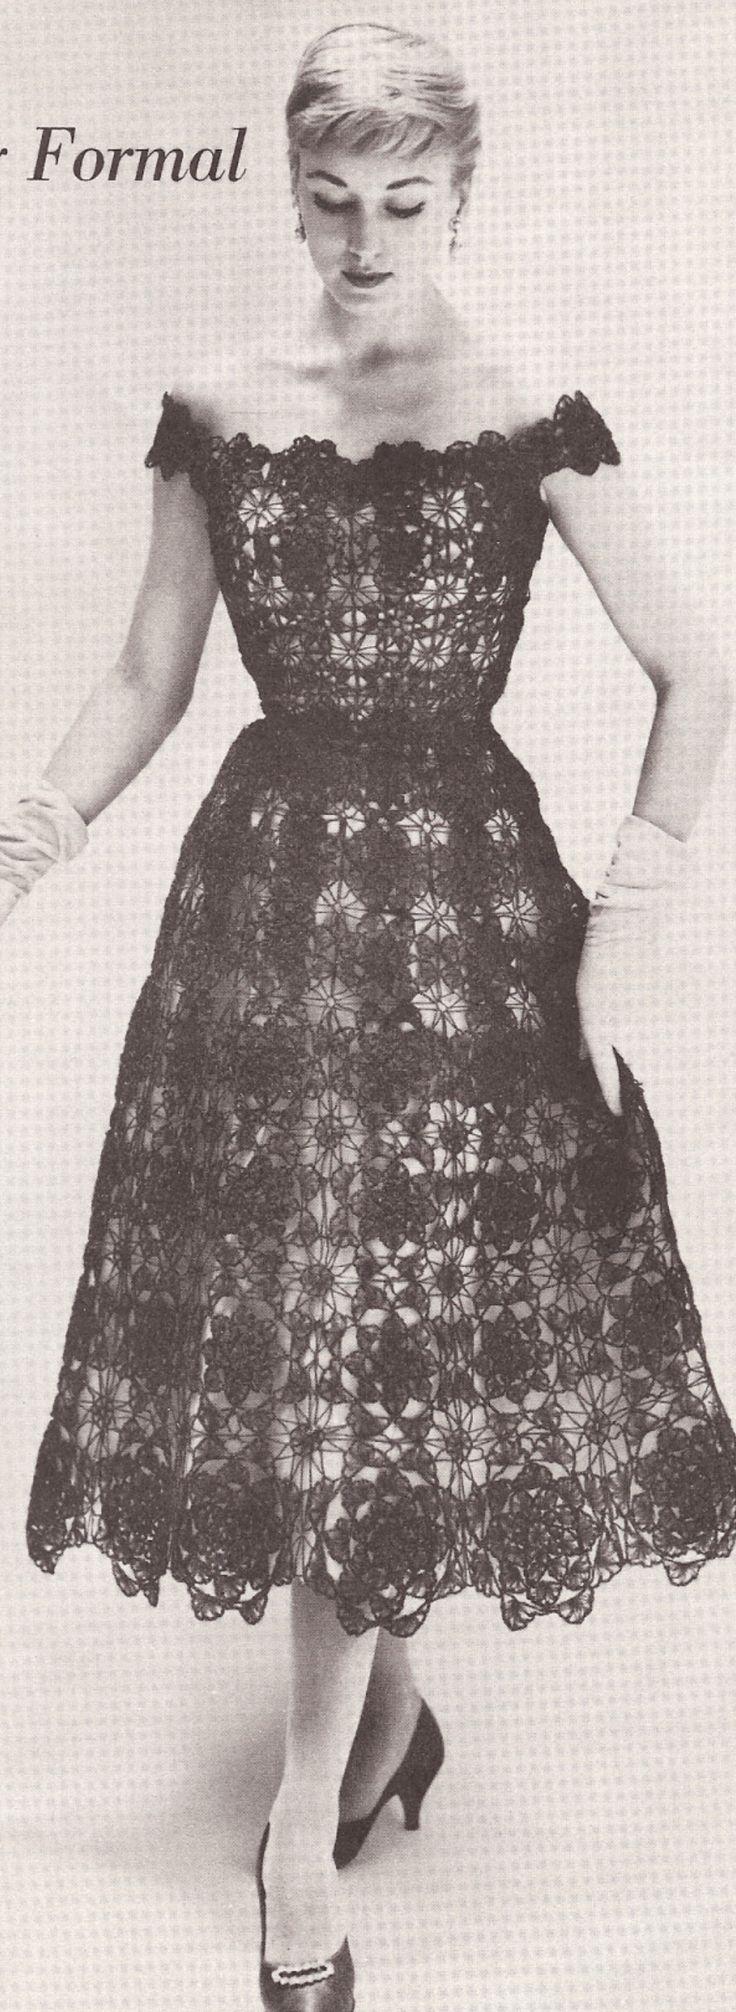 Free Lacy Crochet tuxedo Patterns dressy | Vintage Crochet Lace Formal Evening Dress Pattern 1950s | eBay